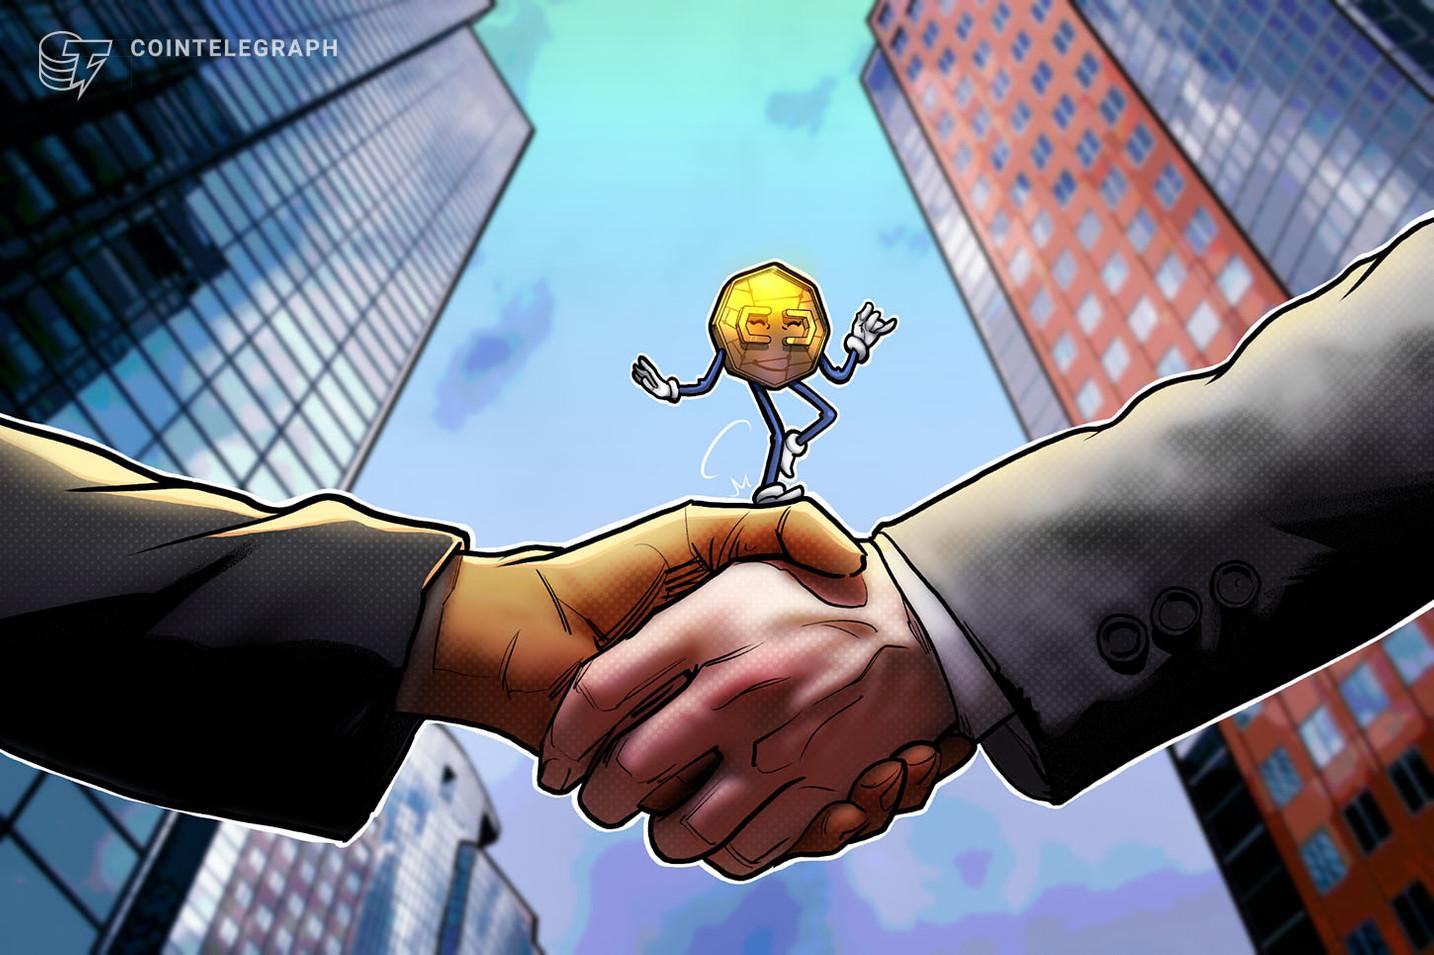 Andreessen Horowitz launches biggest-ever crypto venture fund at $2.2B